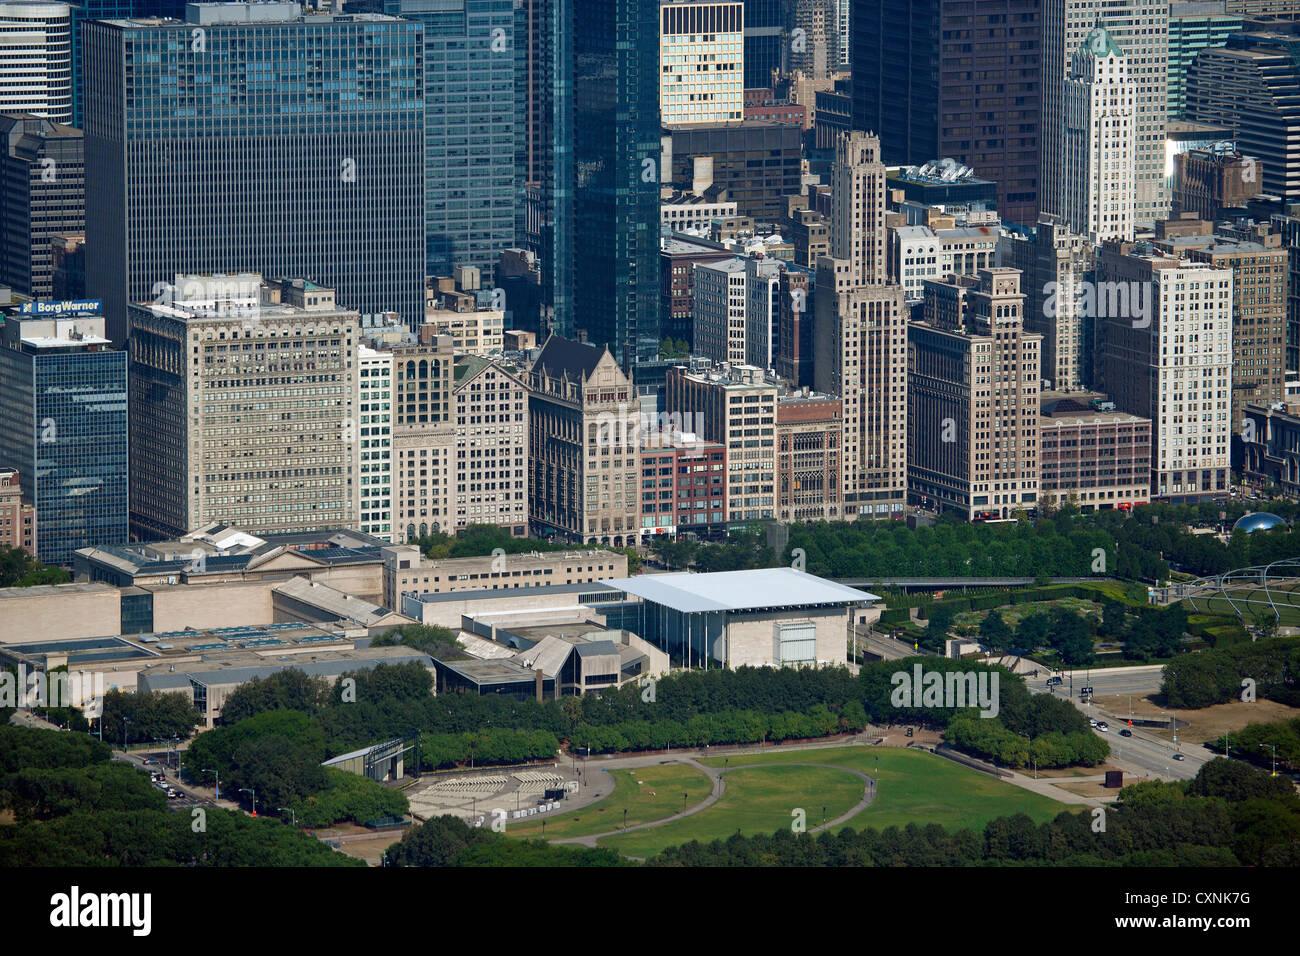 aerial photograph Michigan Avenue Chicago, Illinois - Stock Image